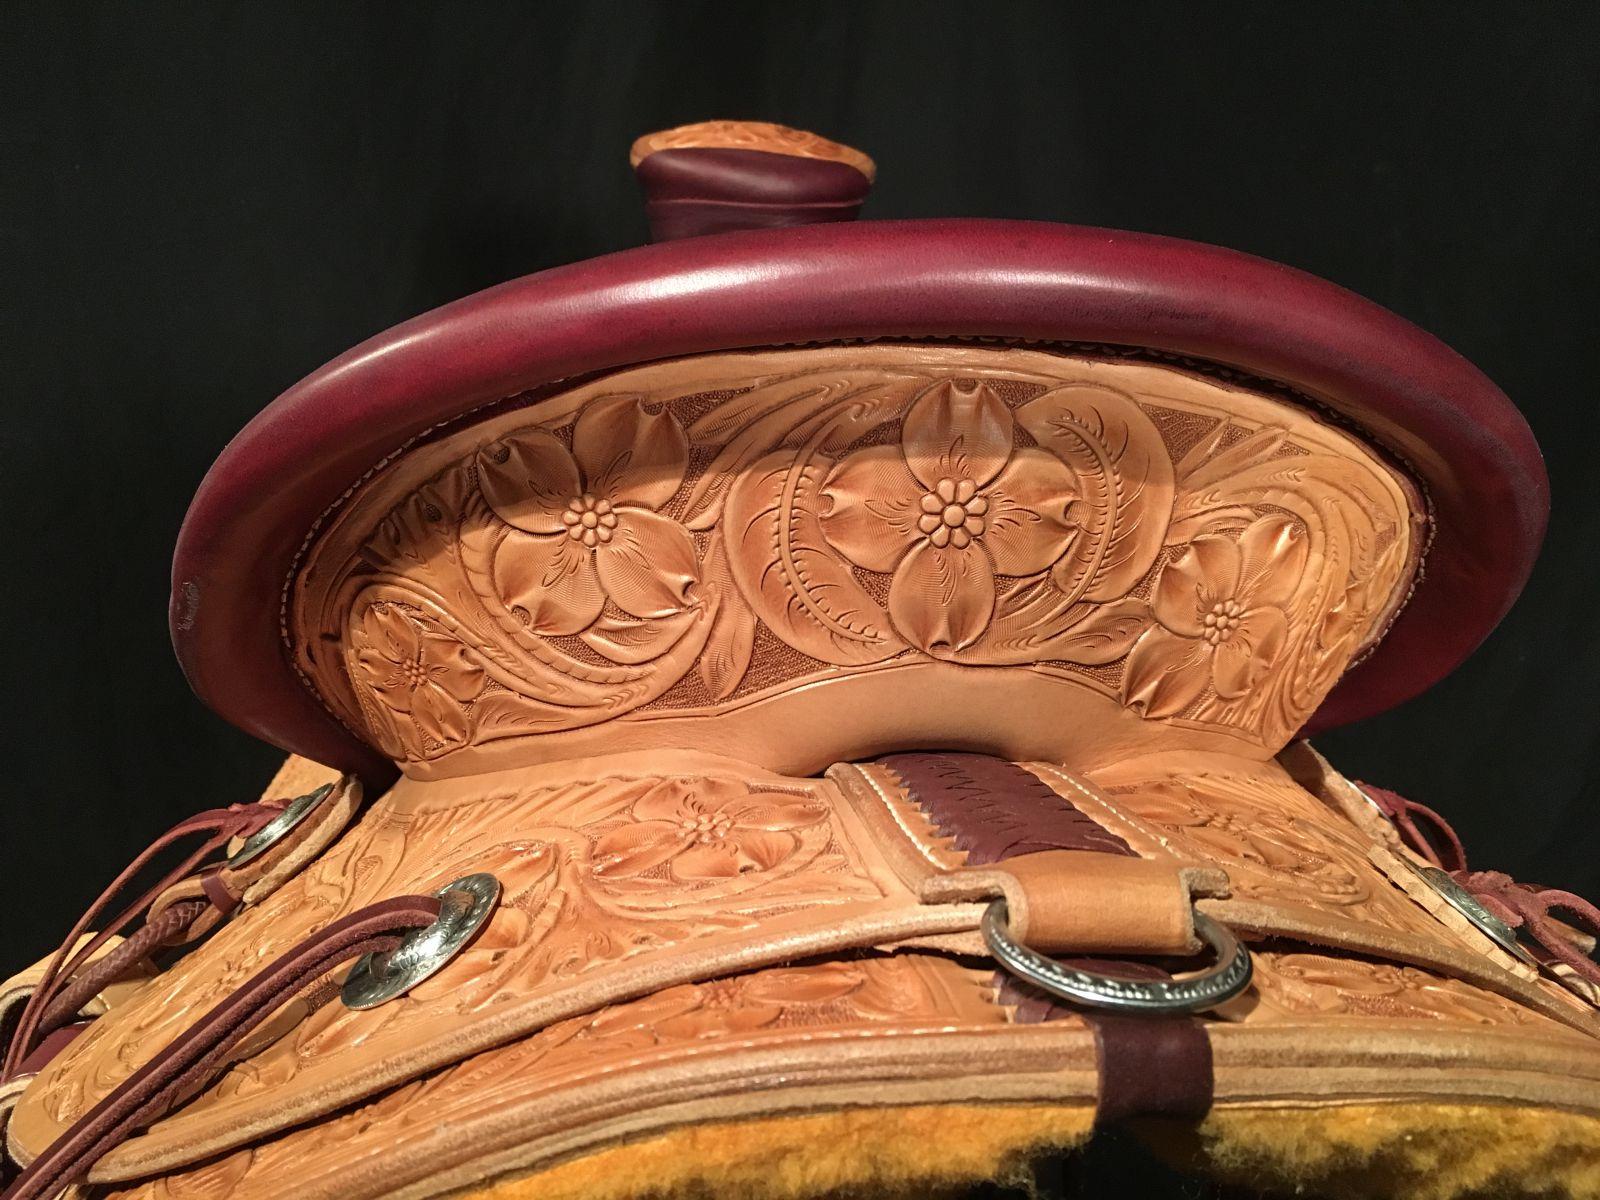 Custom Cantle Tooling